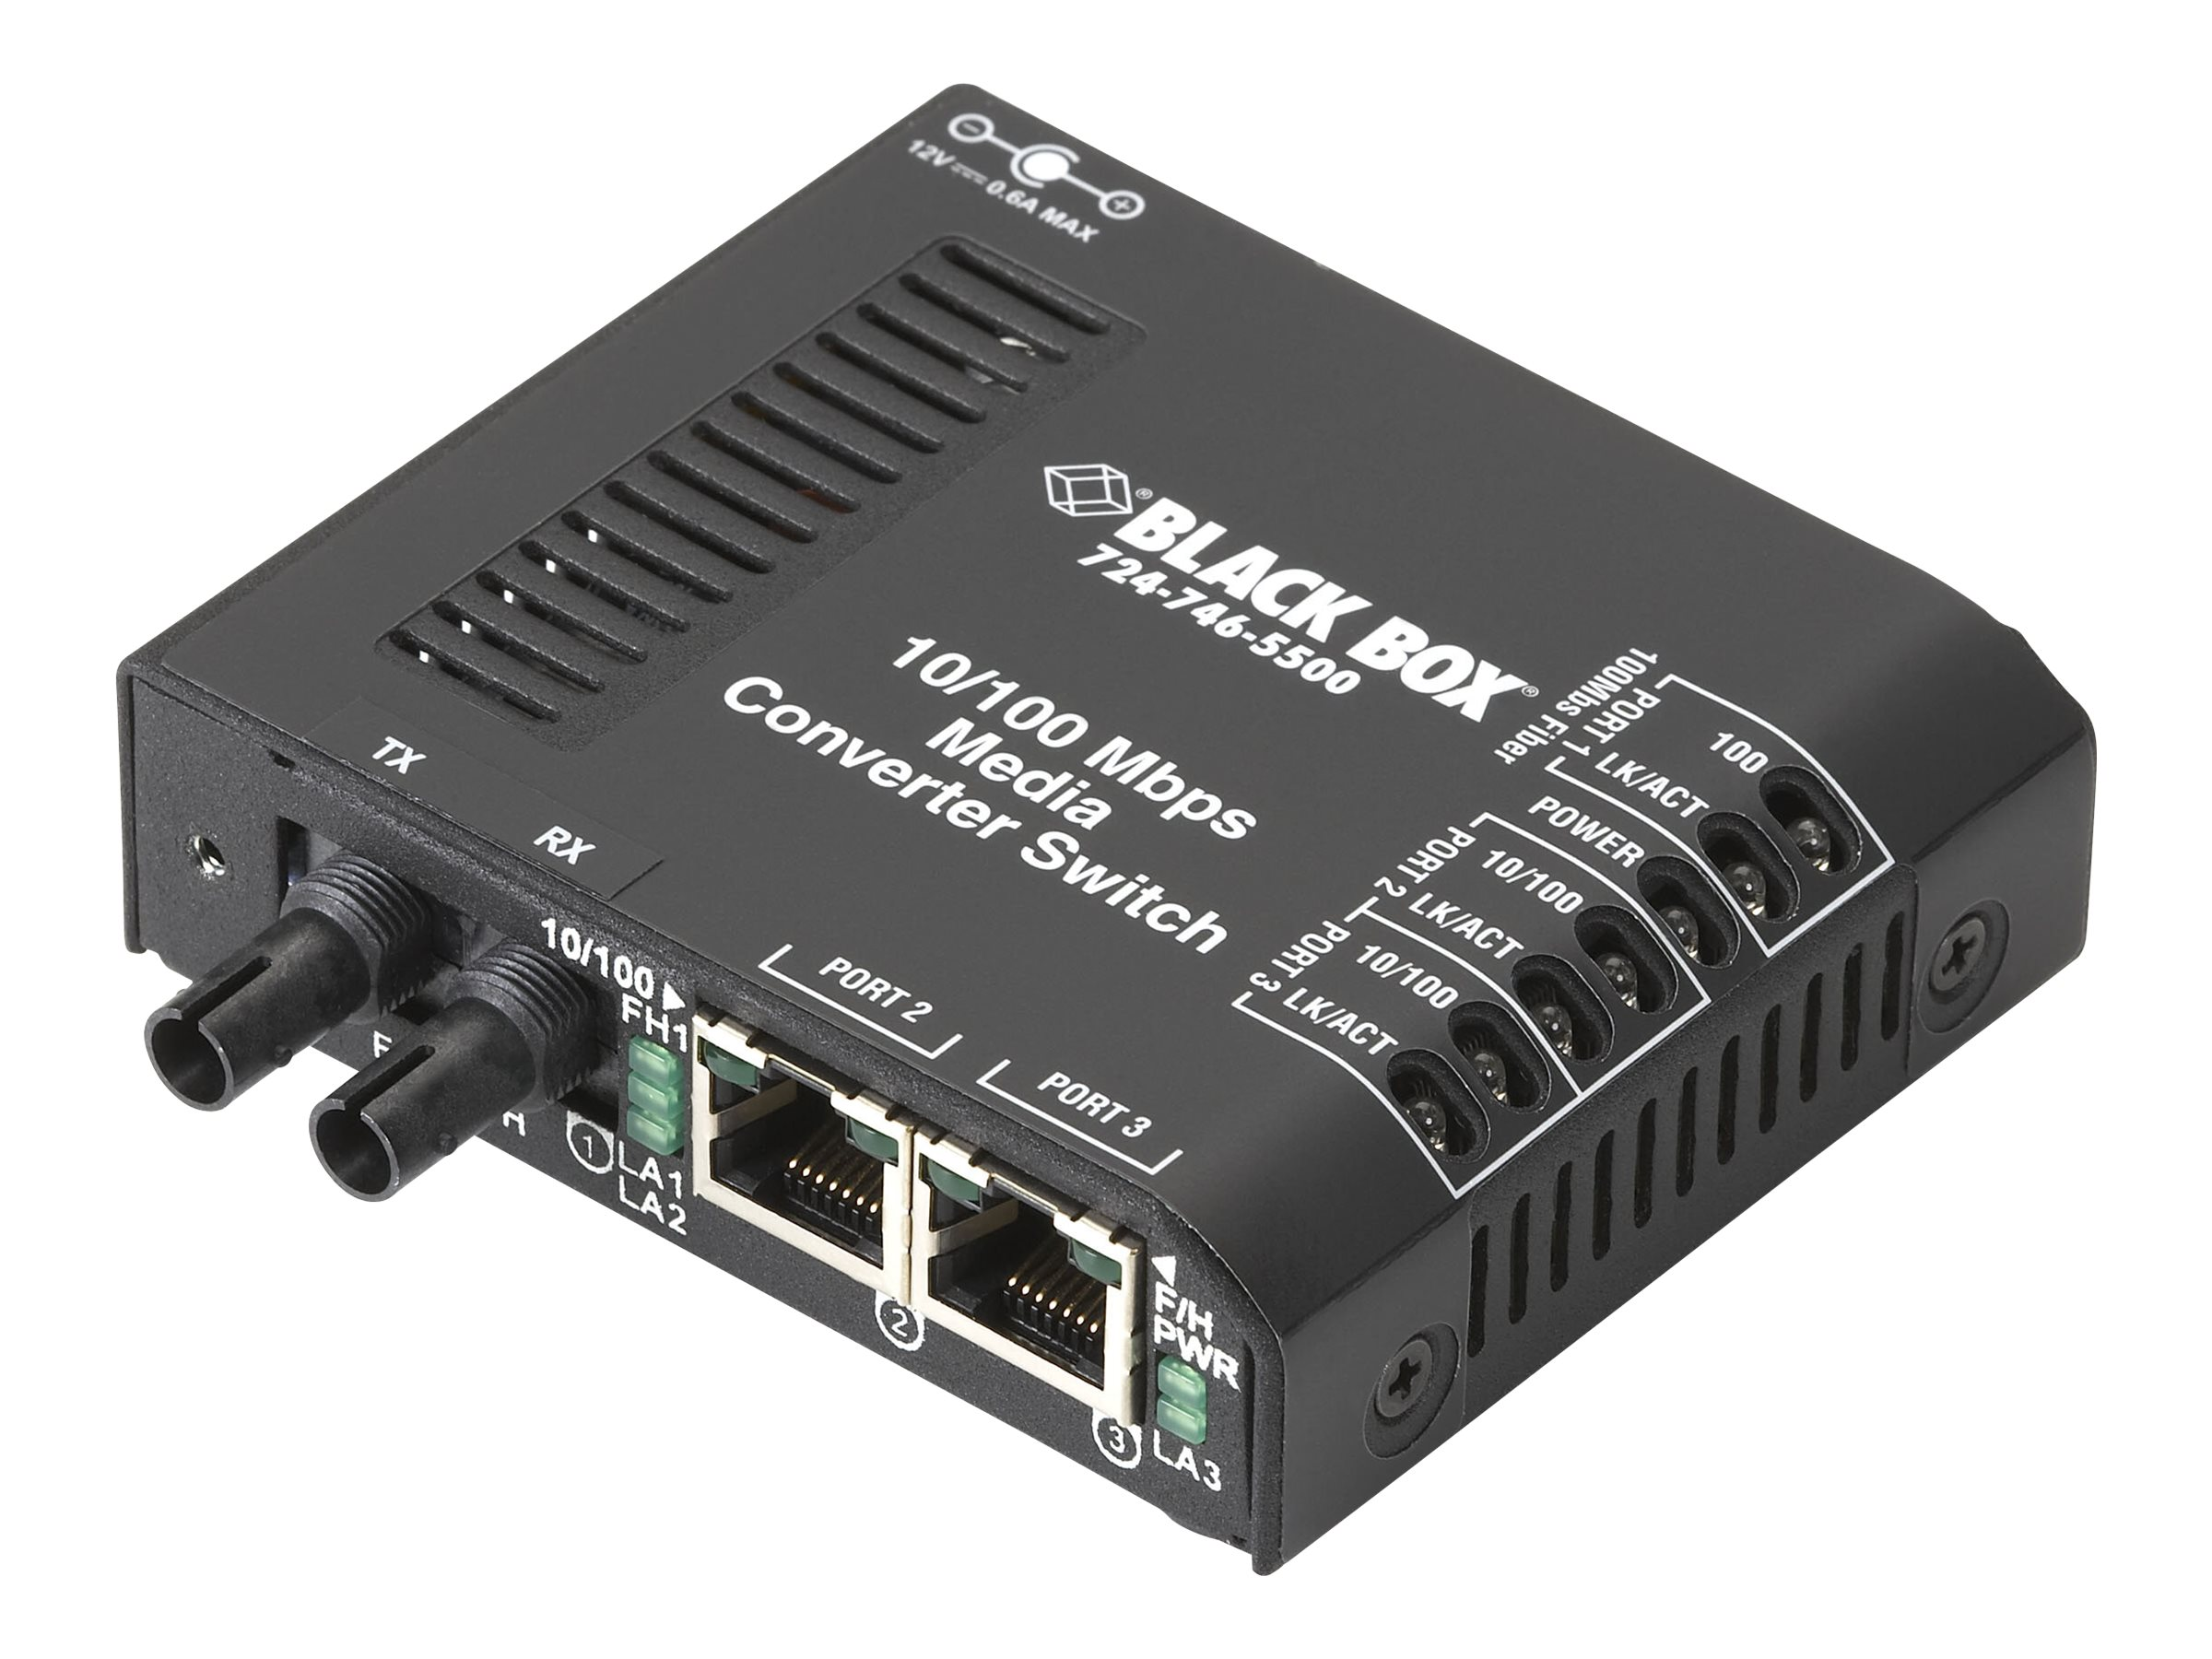 Black Box Media Converter Switch 10/100-Mbps Copper to 100-Mbps Fiber, 115-VAC, Multimode, ST - Medienkonverter - 100Mb LAN - 10